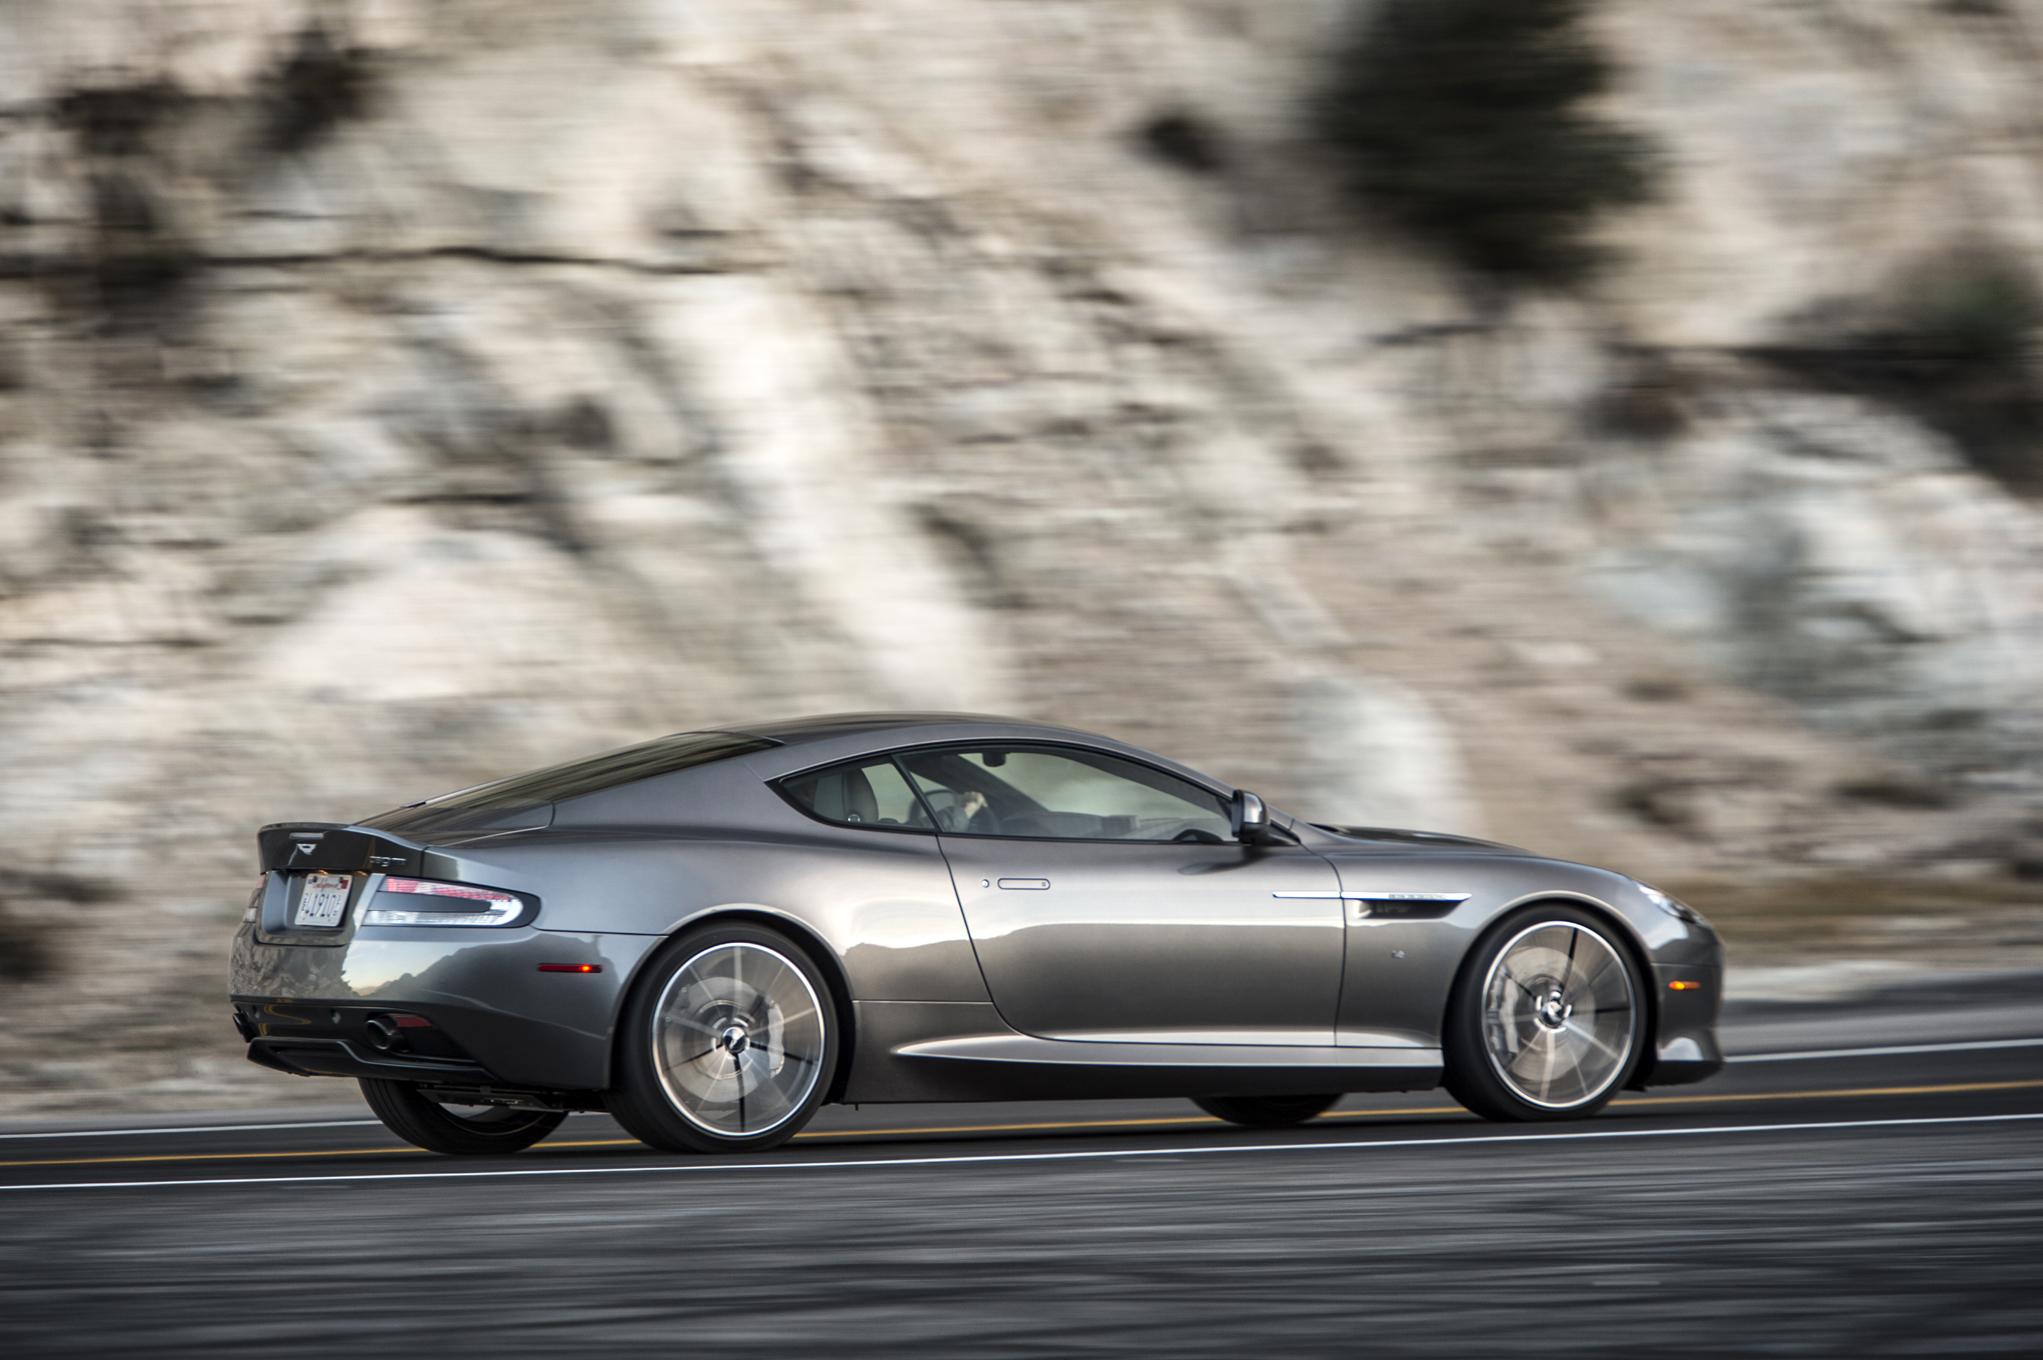 Watch Aston Martin Teases New Twin Turbo 5 2 Liter V 12